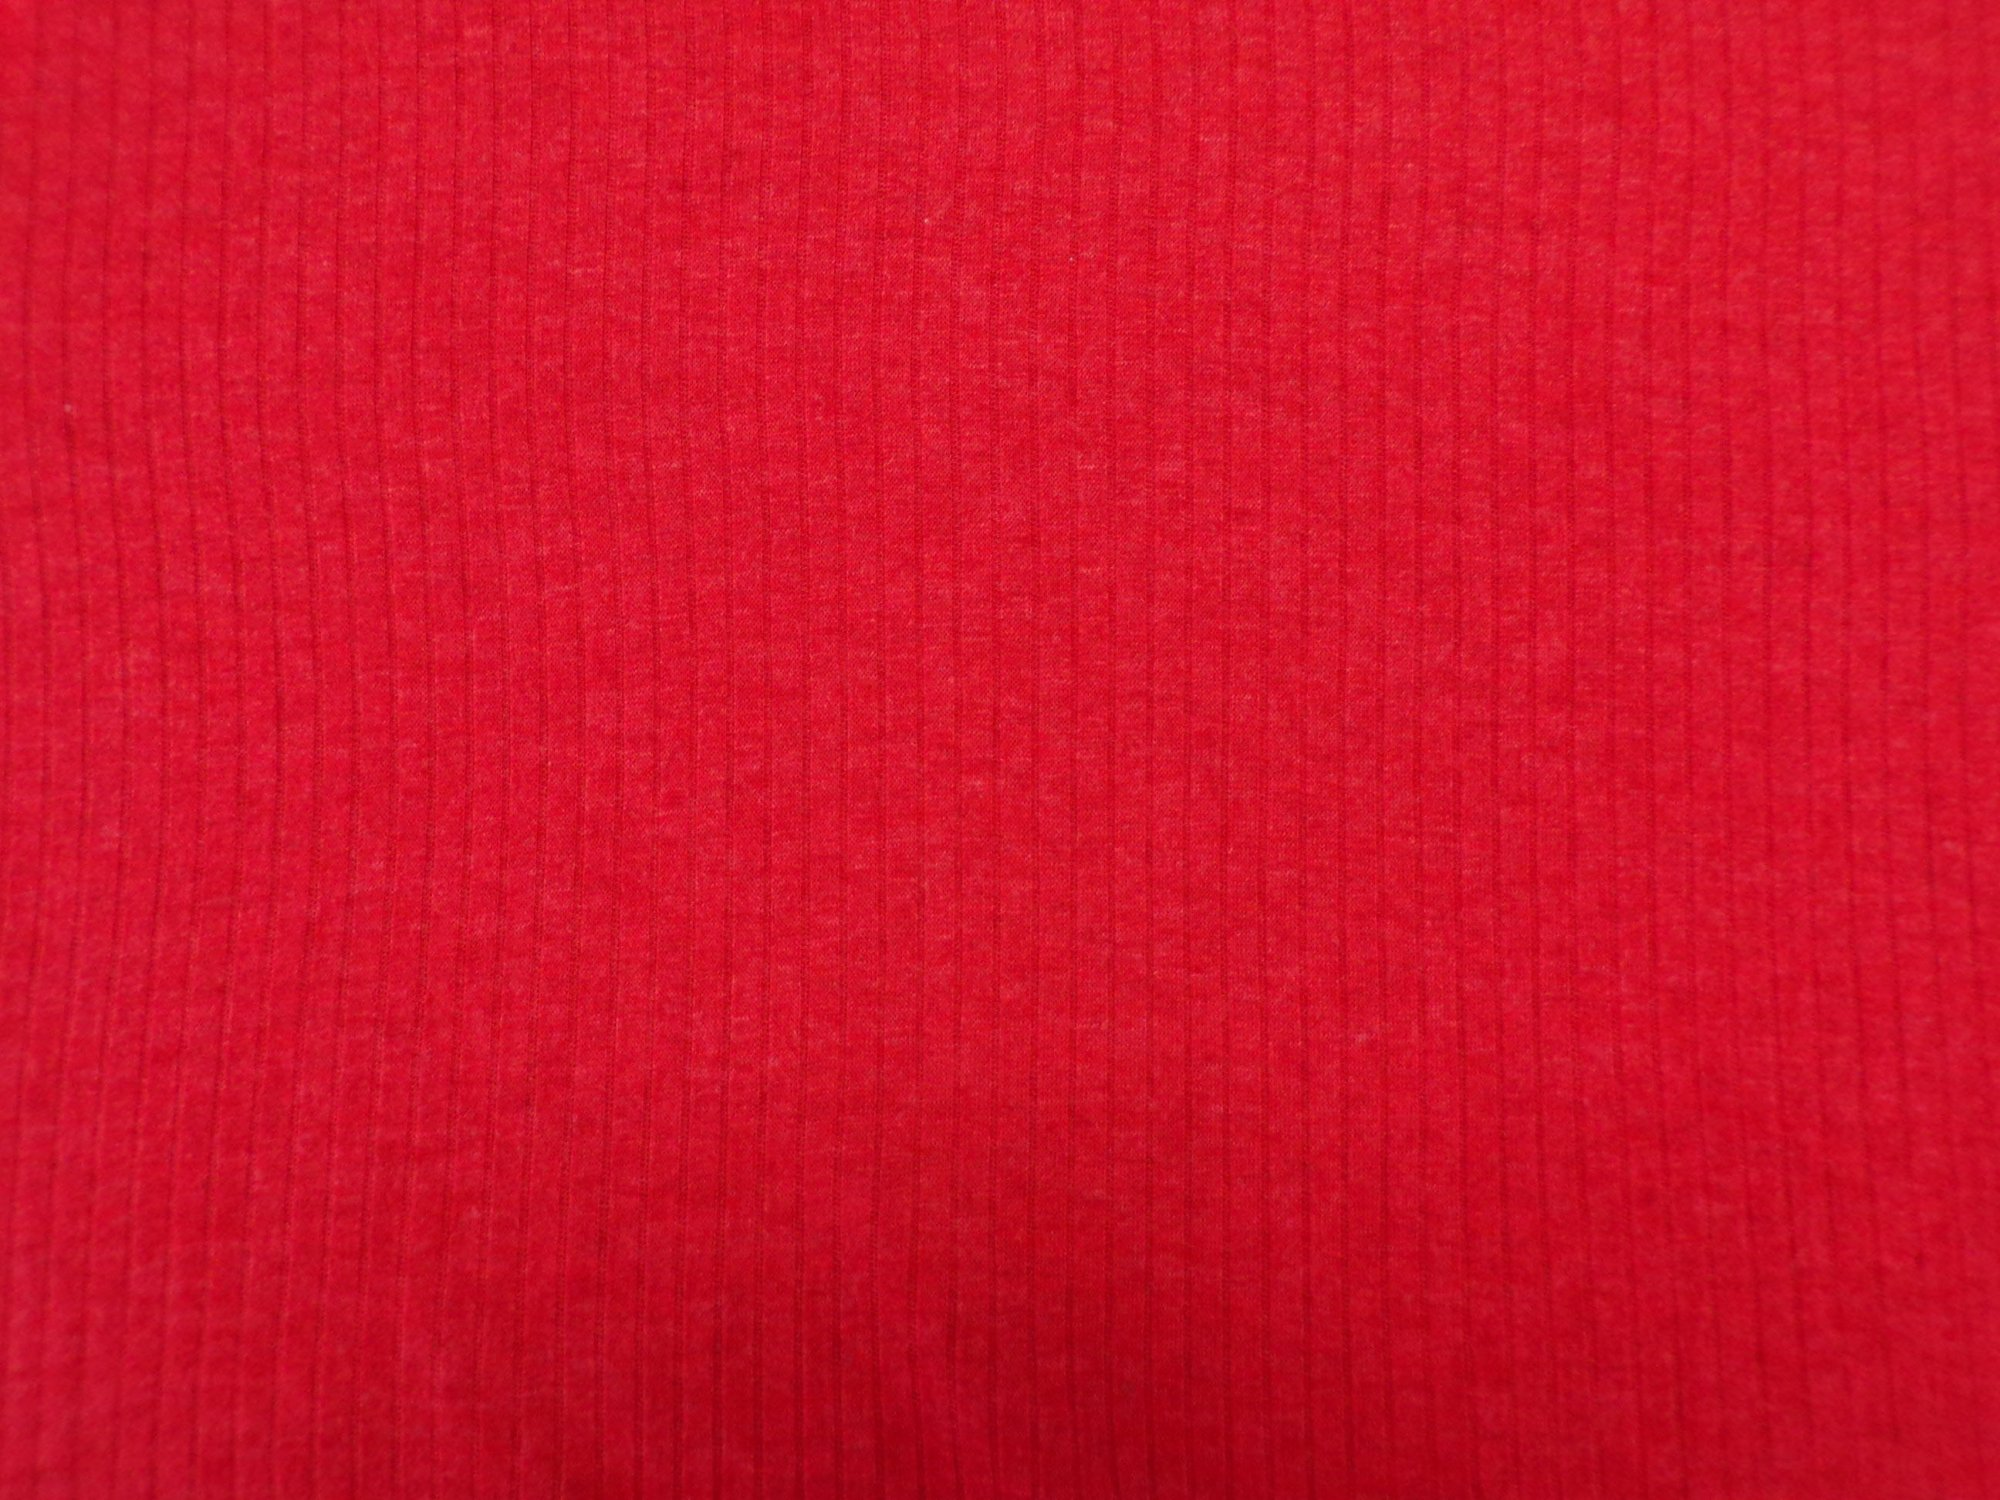 Cotton Needleout Jersey - Bright Rust